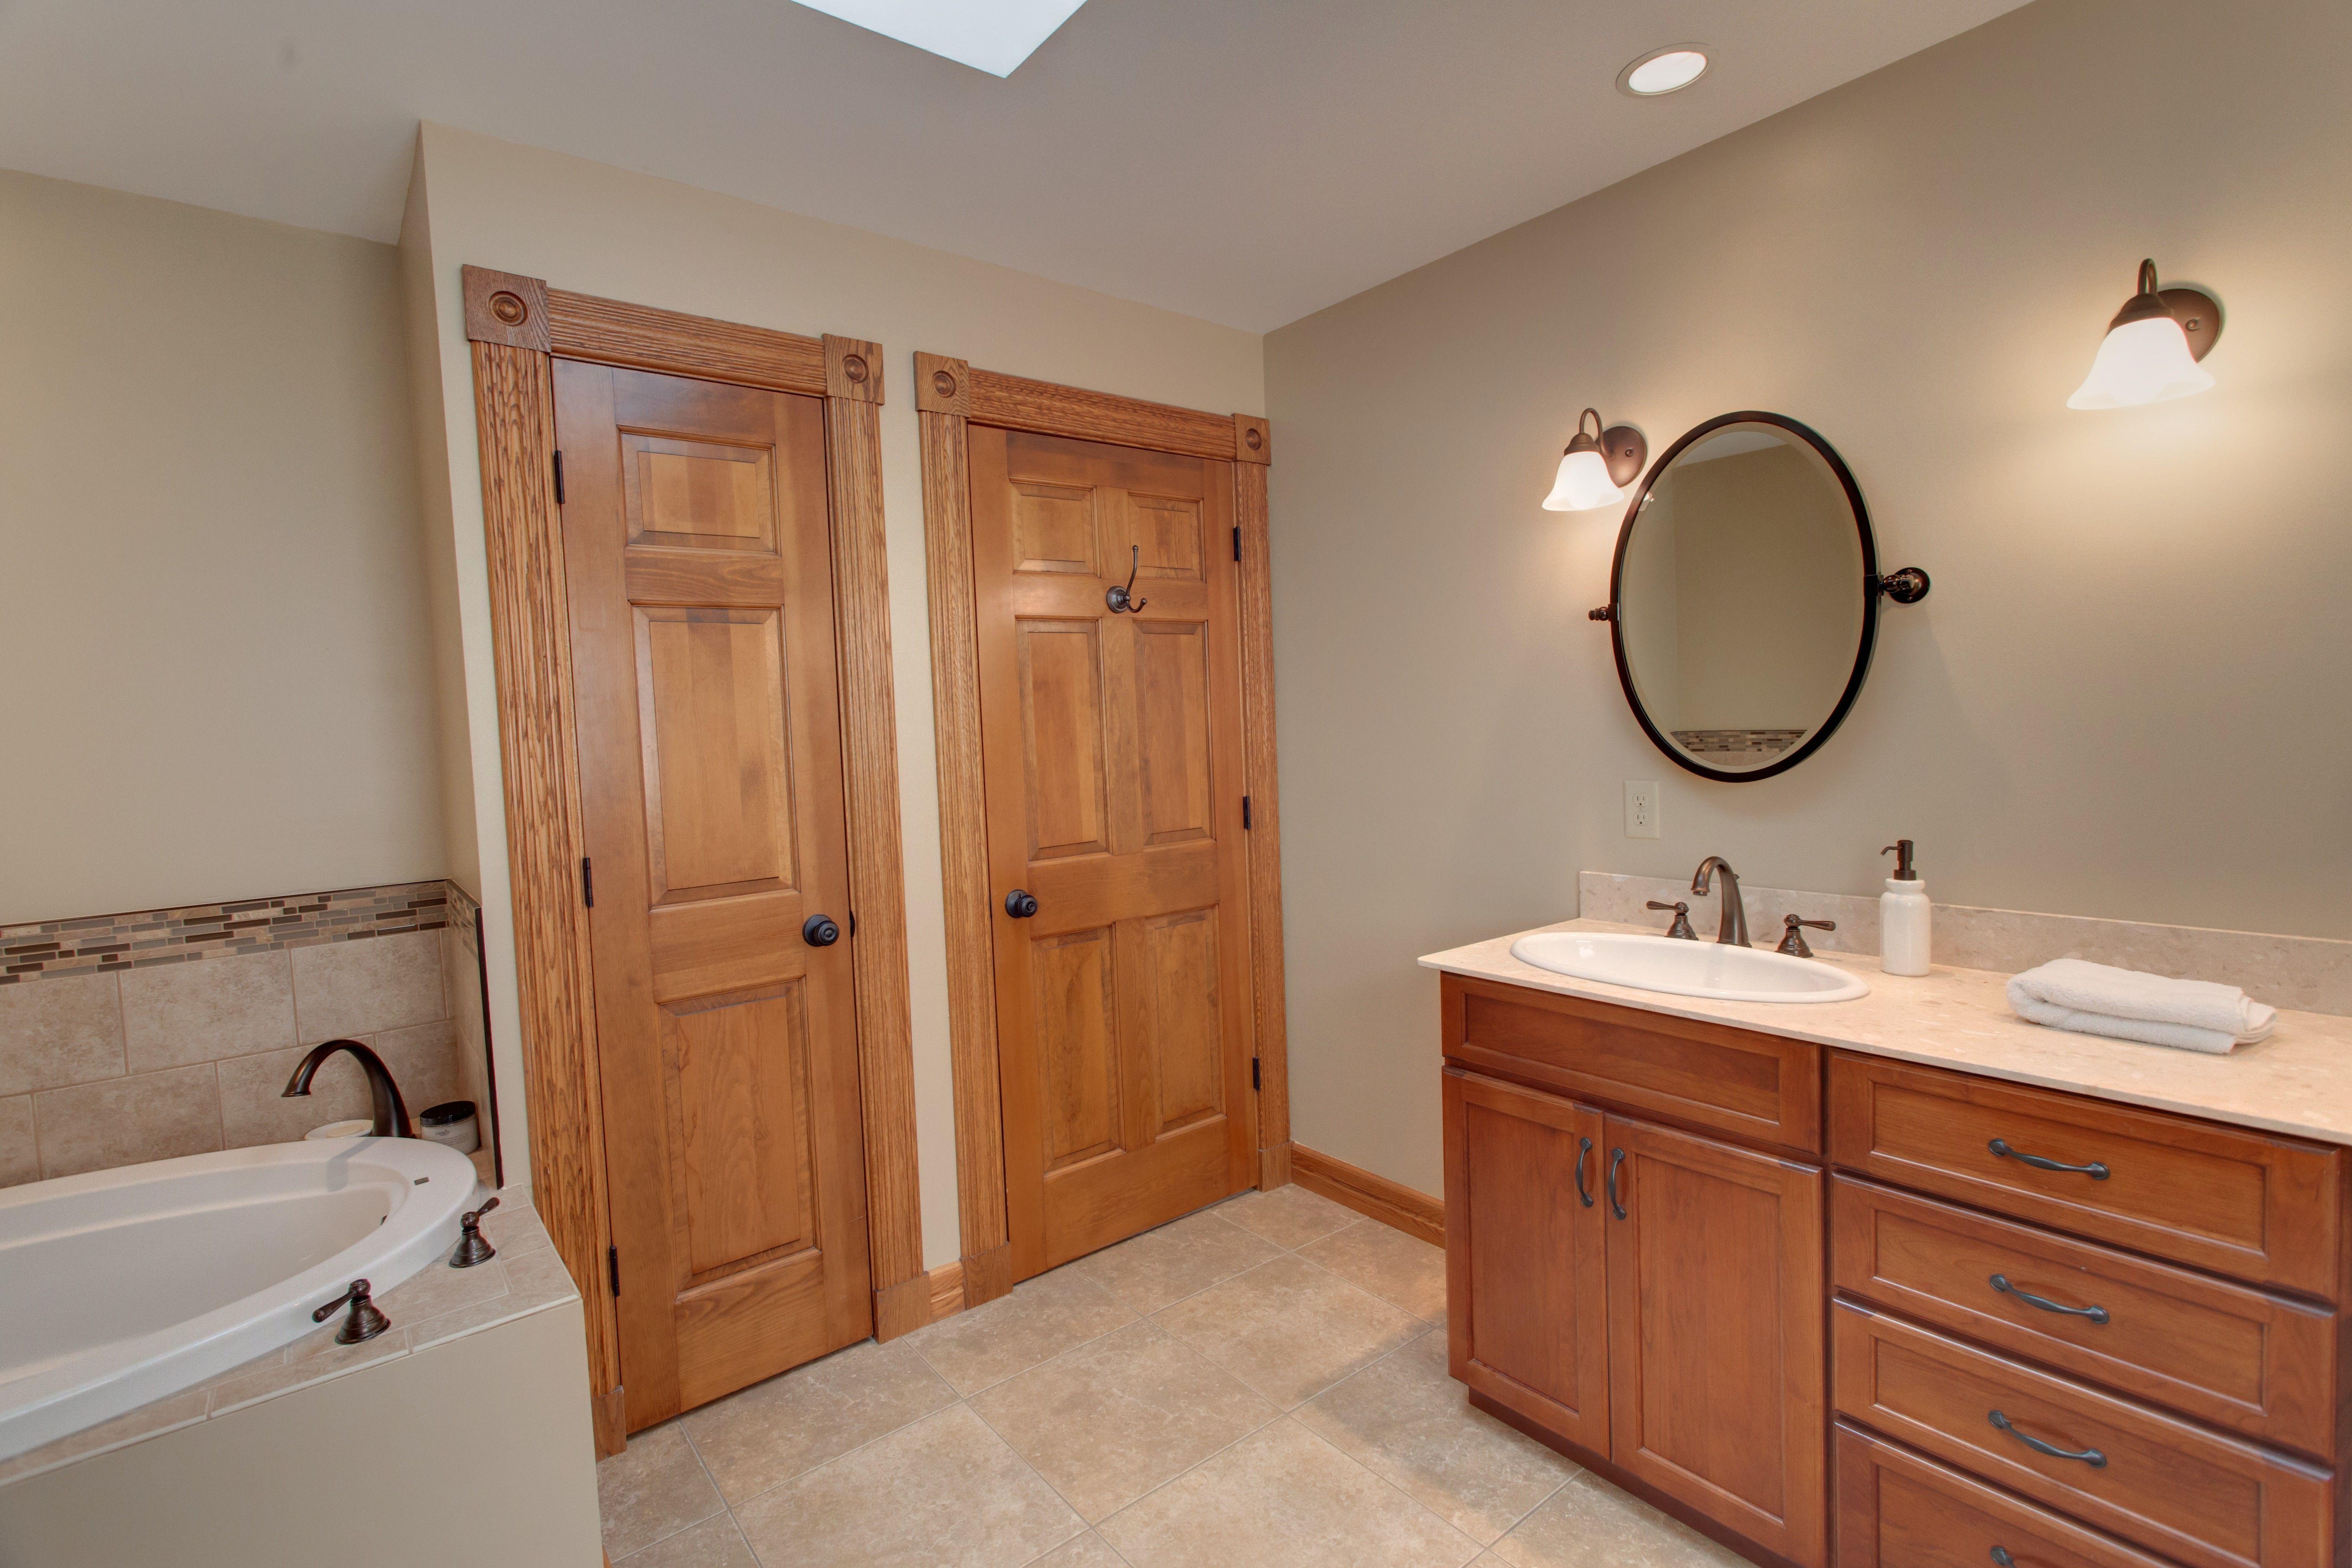 Bathrooms Tony Trapp Remodeling Repair Www Tonytrappllc Com Bathroom Remodel Bathroom Mirror